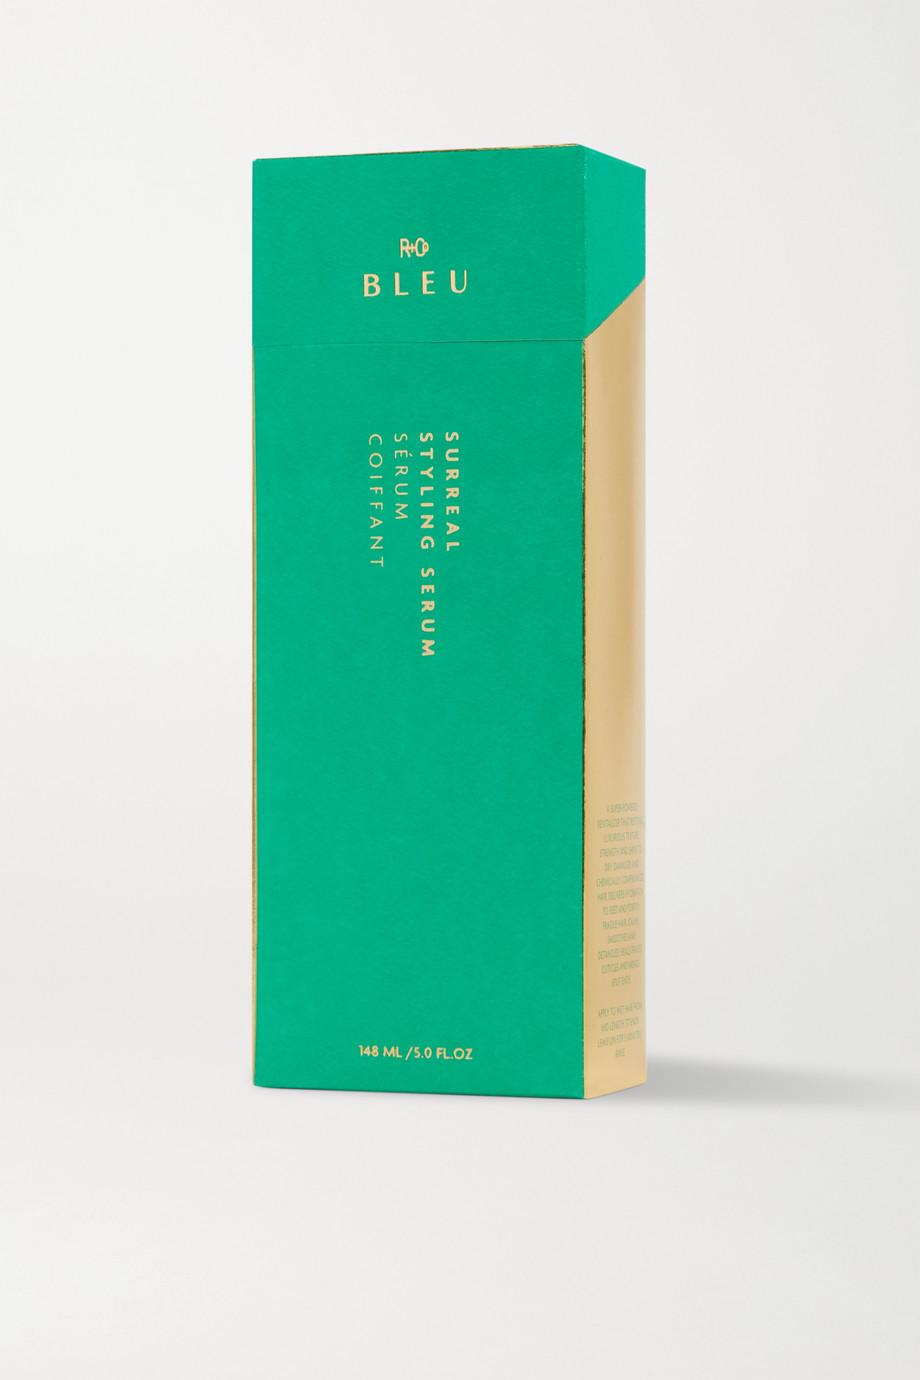 R+Co BLEU Surreal Styling Serum, 148ml